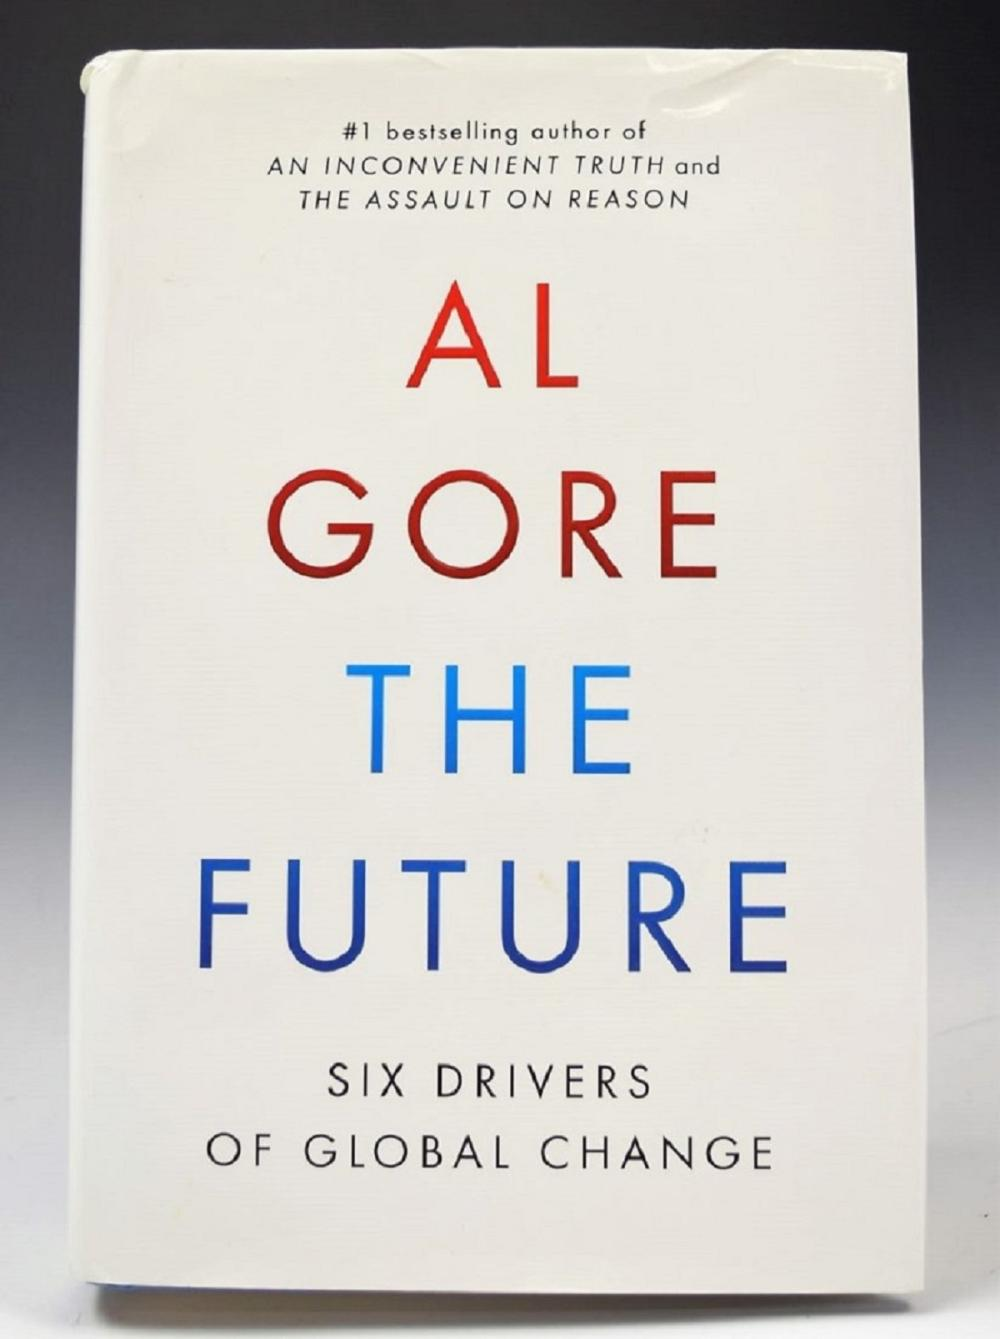 Al Gore Signed Book